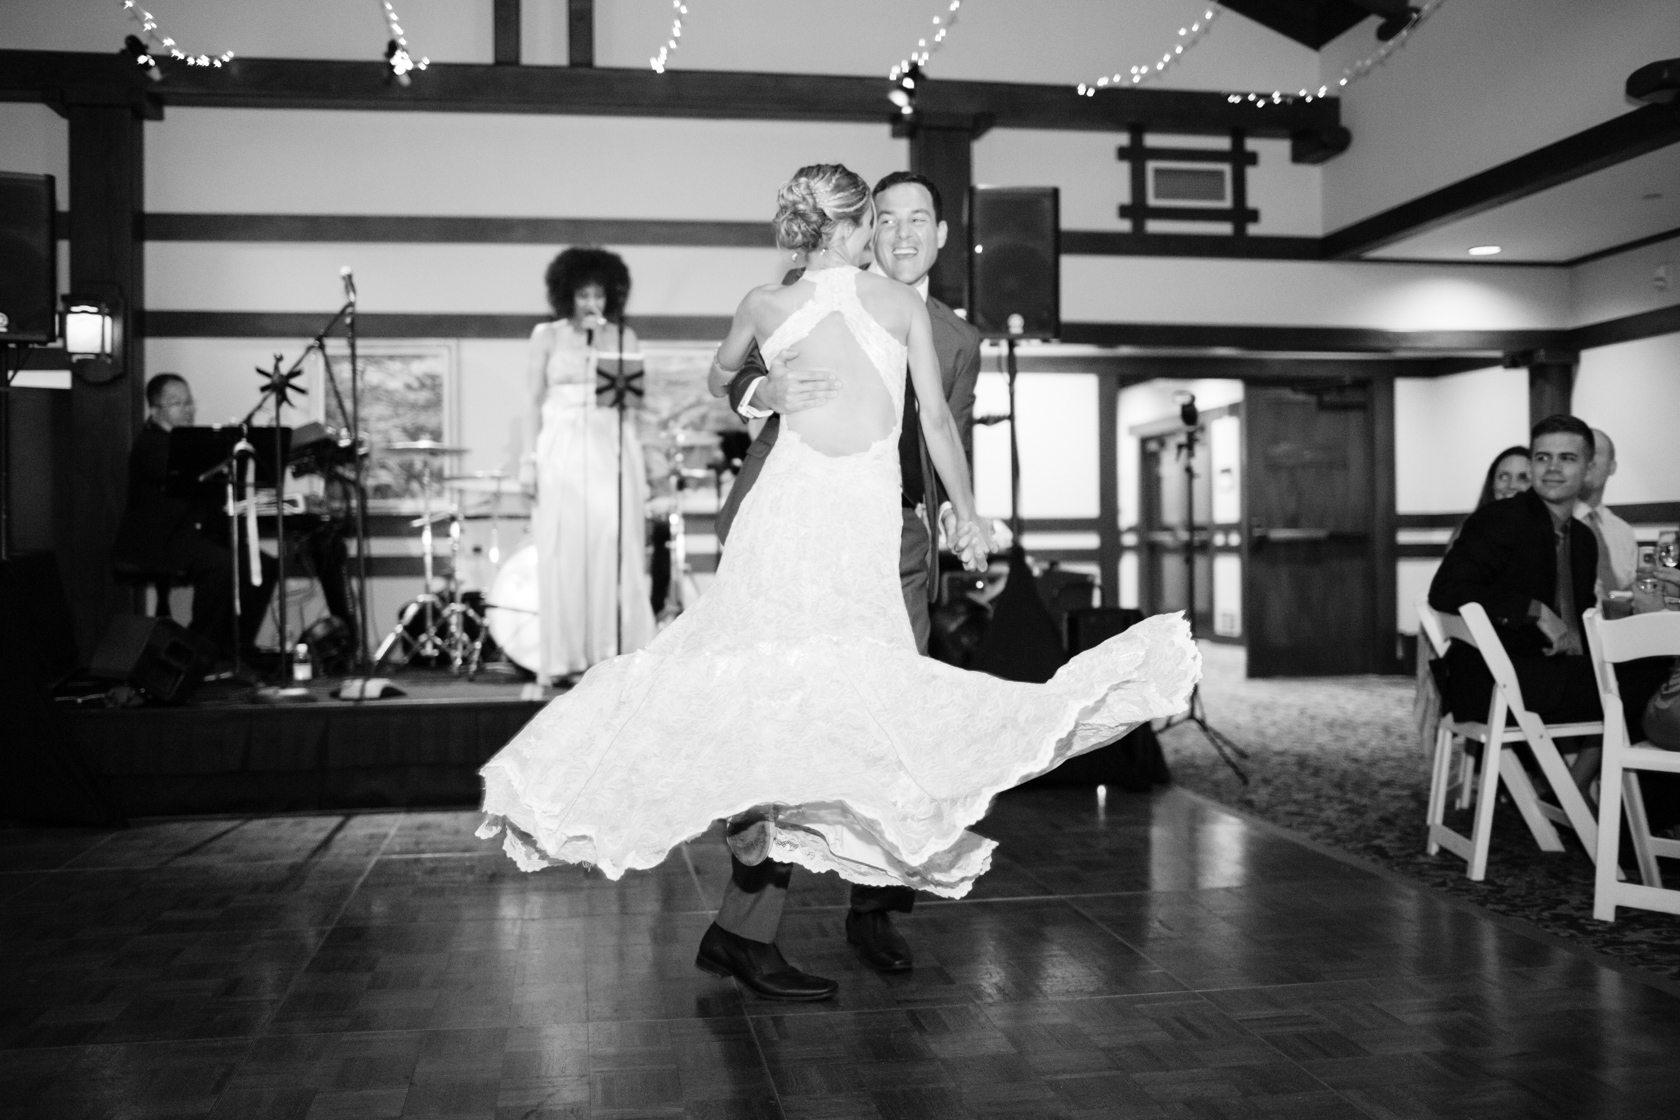 The_Lodge_at_Torrey_Pines_Wedding_095.jpg